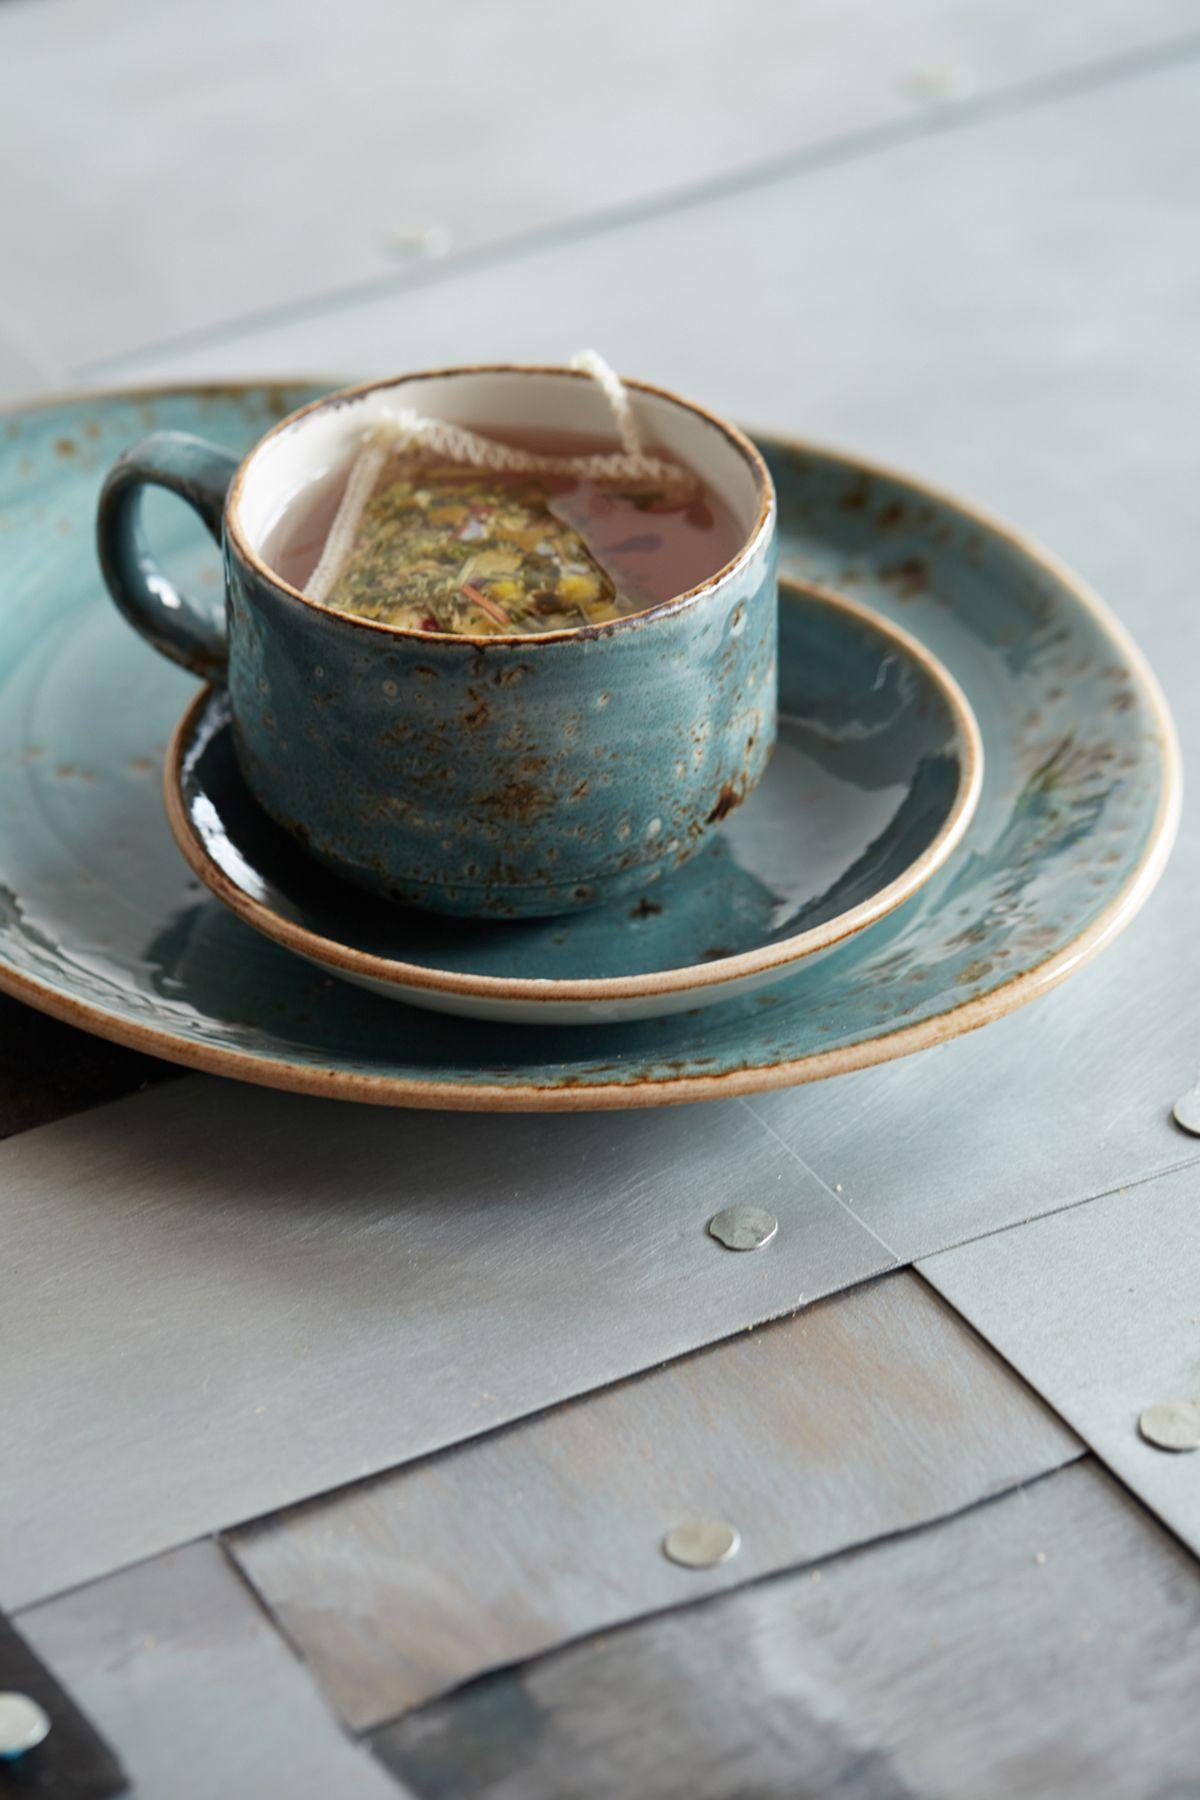 craft on steelite performance home pinterest geschirr keramik and porzellan. Black Bedroom Furniture Sets. Home Design Ideas